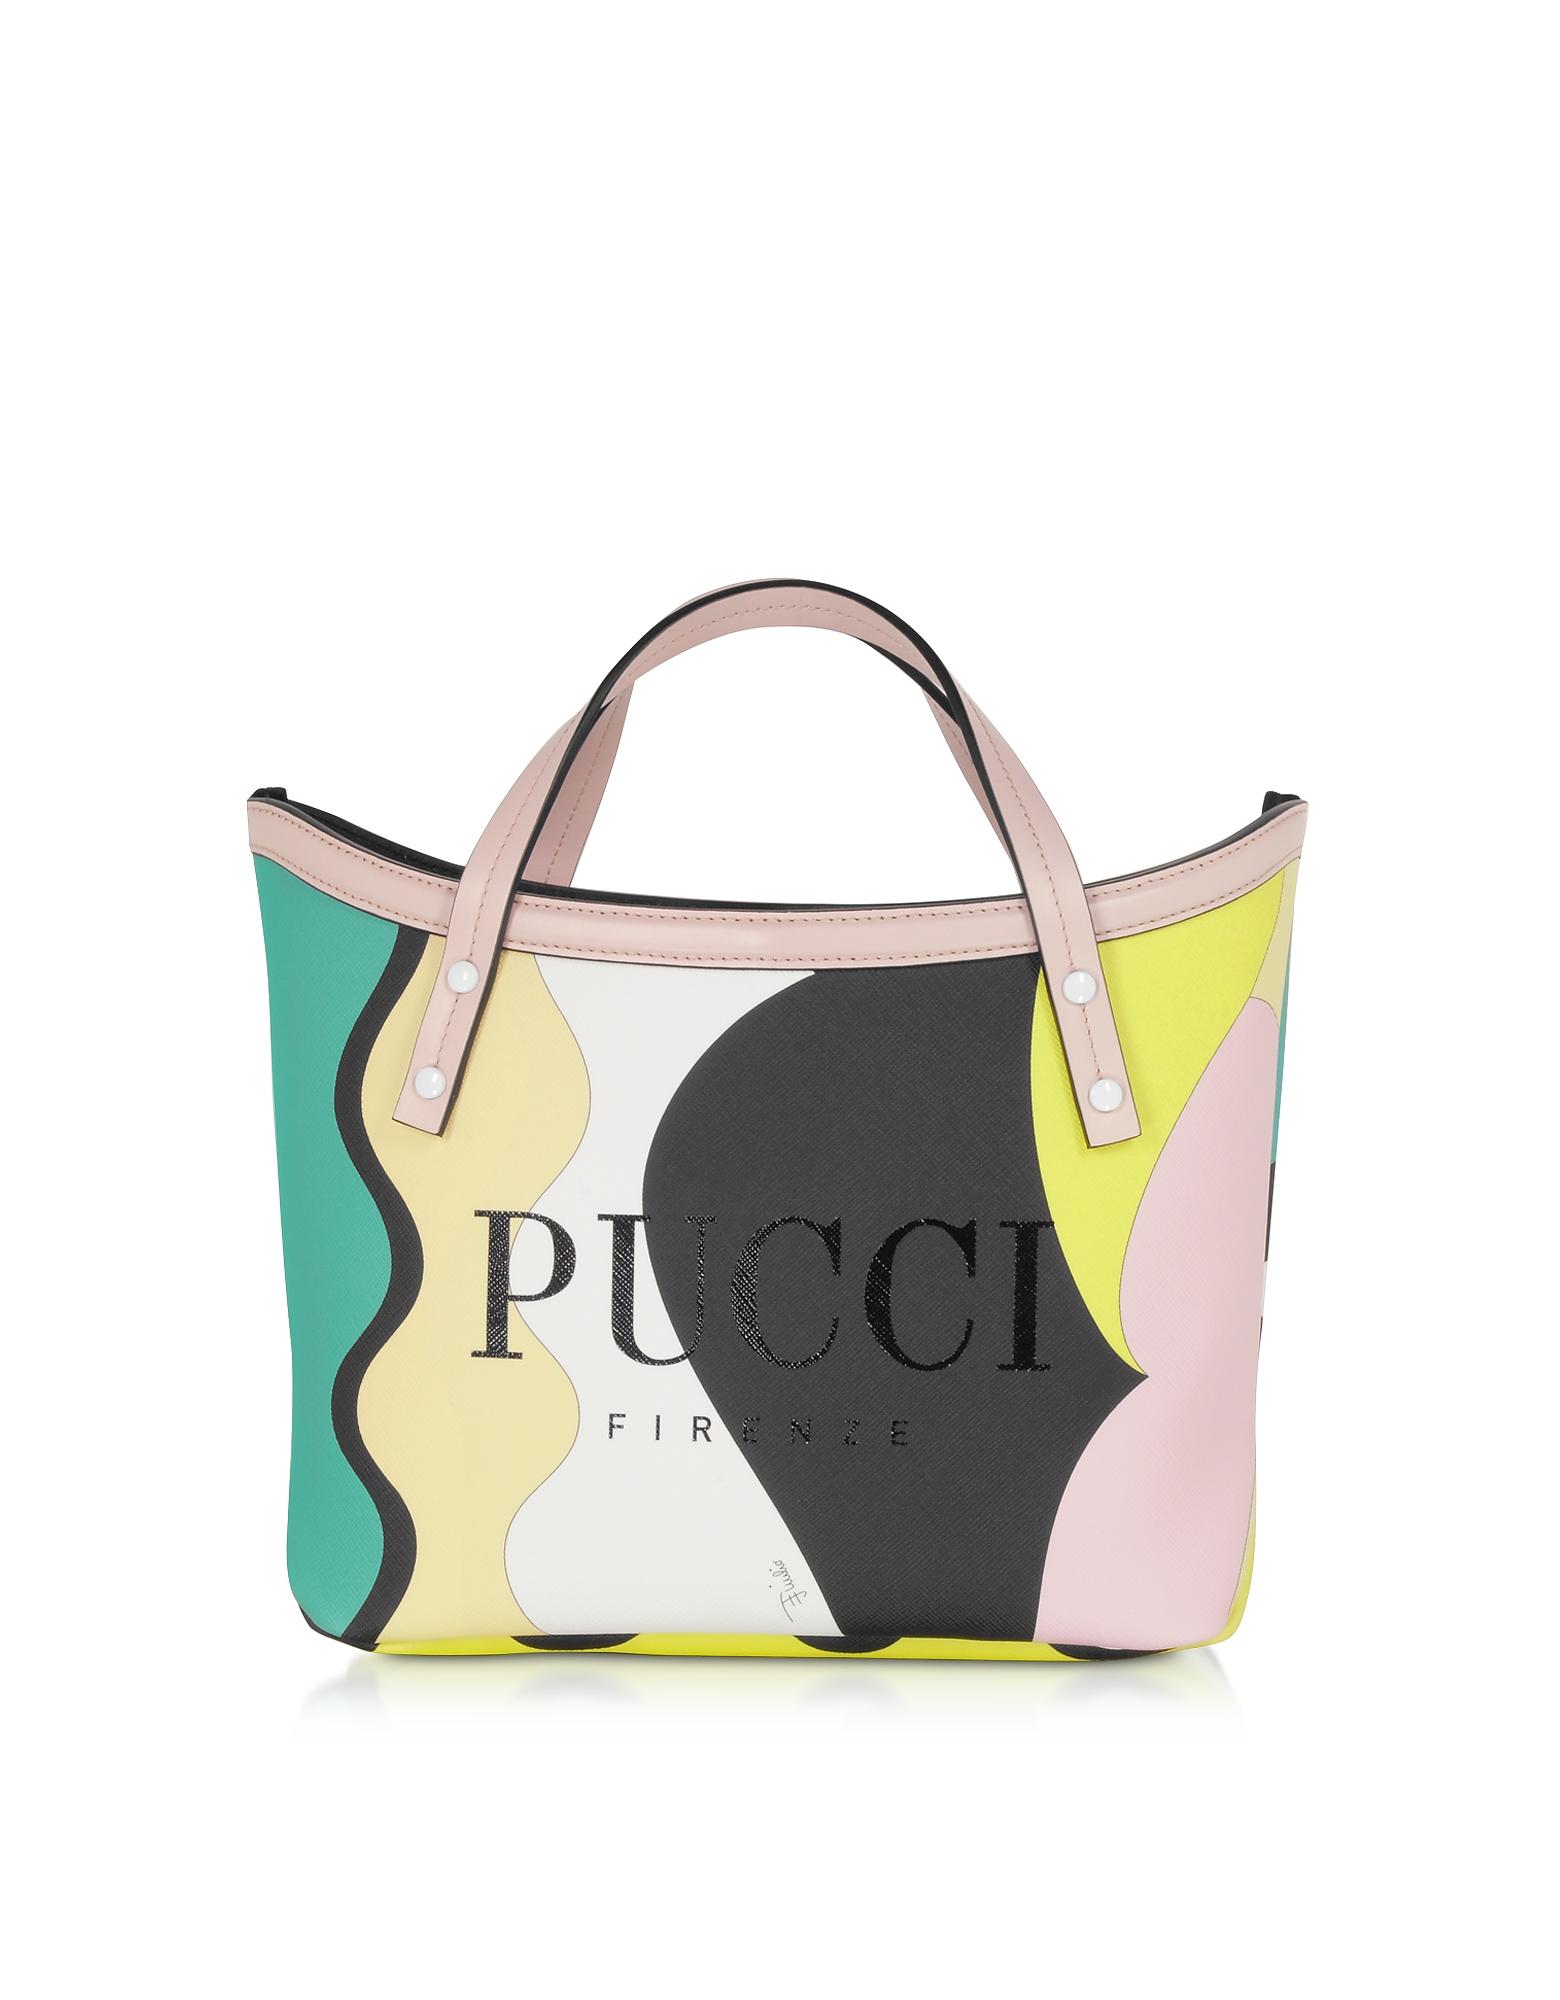 Emilio Pucci Designer Handbags, Two Tone Coated Canvas Tote Bag